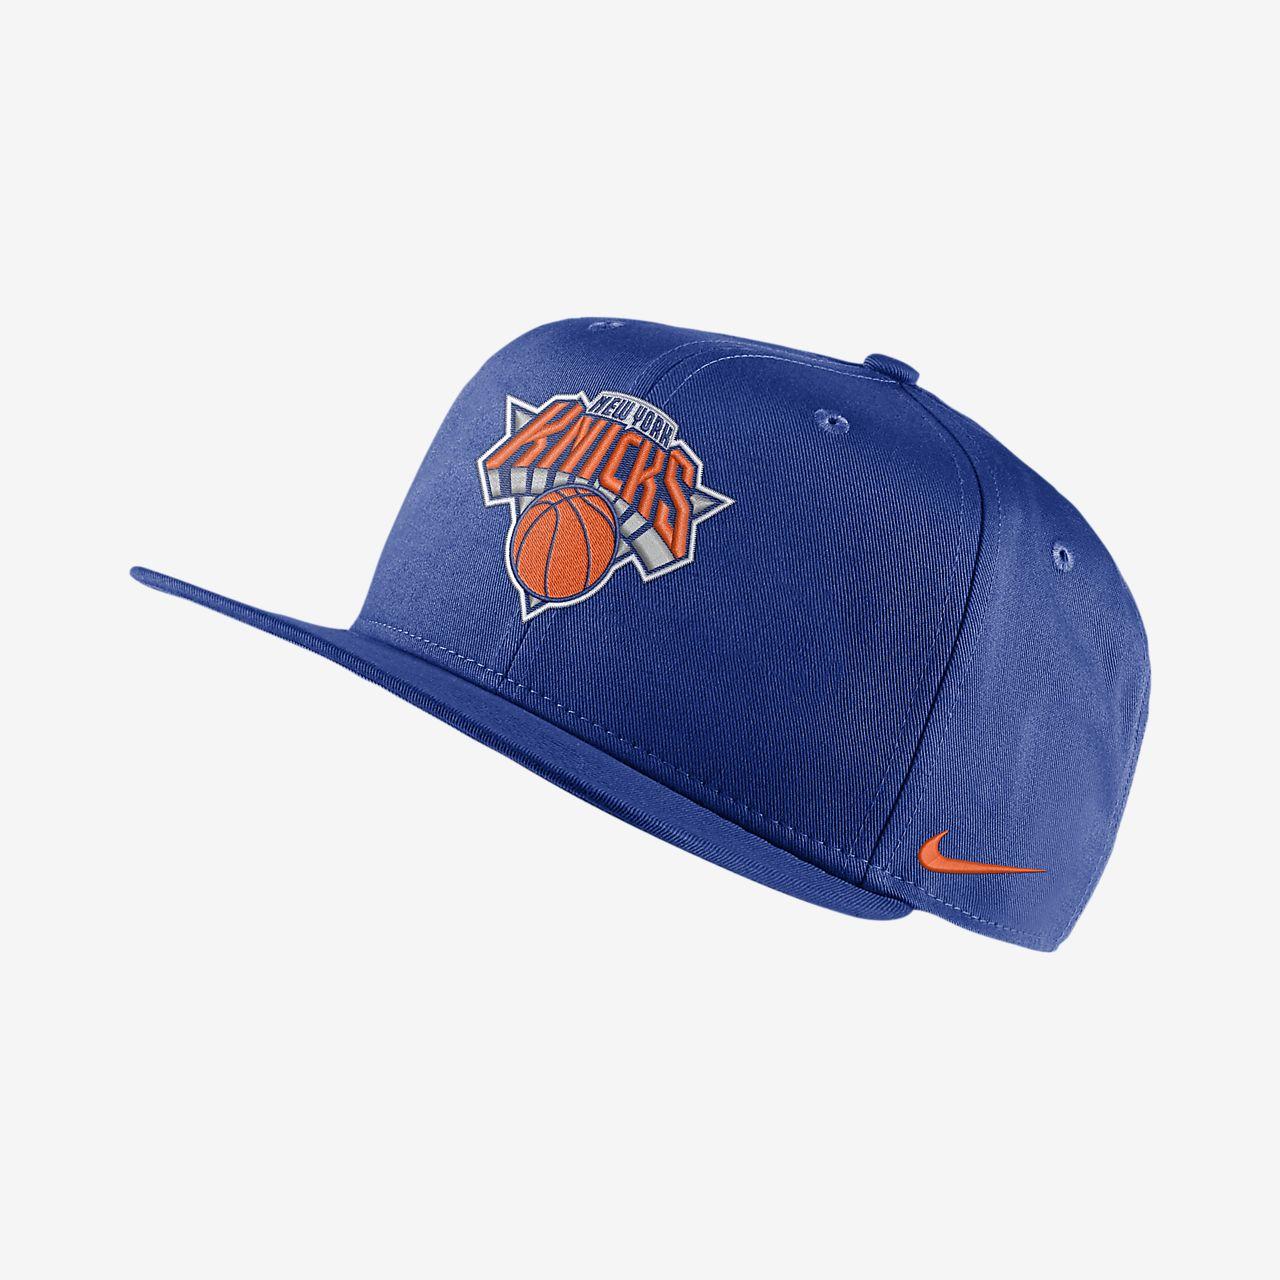 New York Knicks Nike Pro NBA Şapka